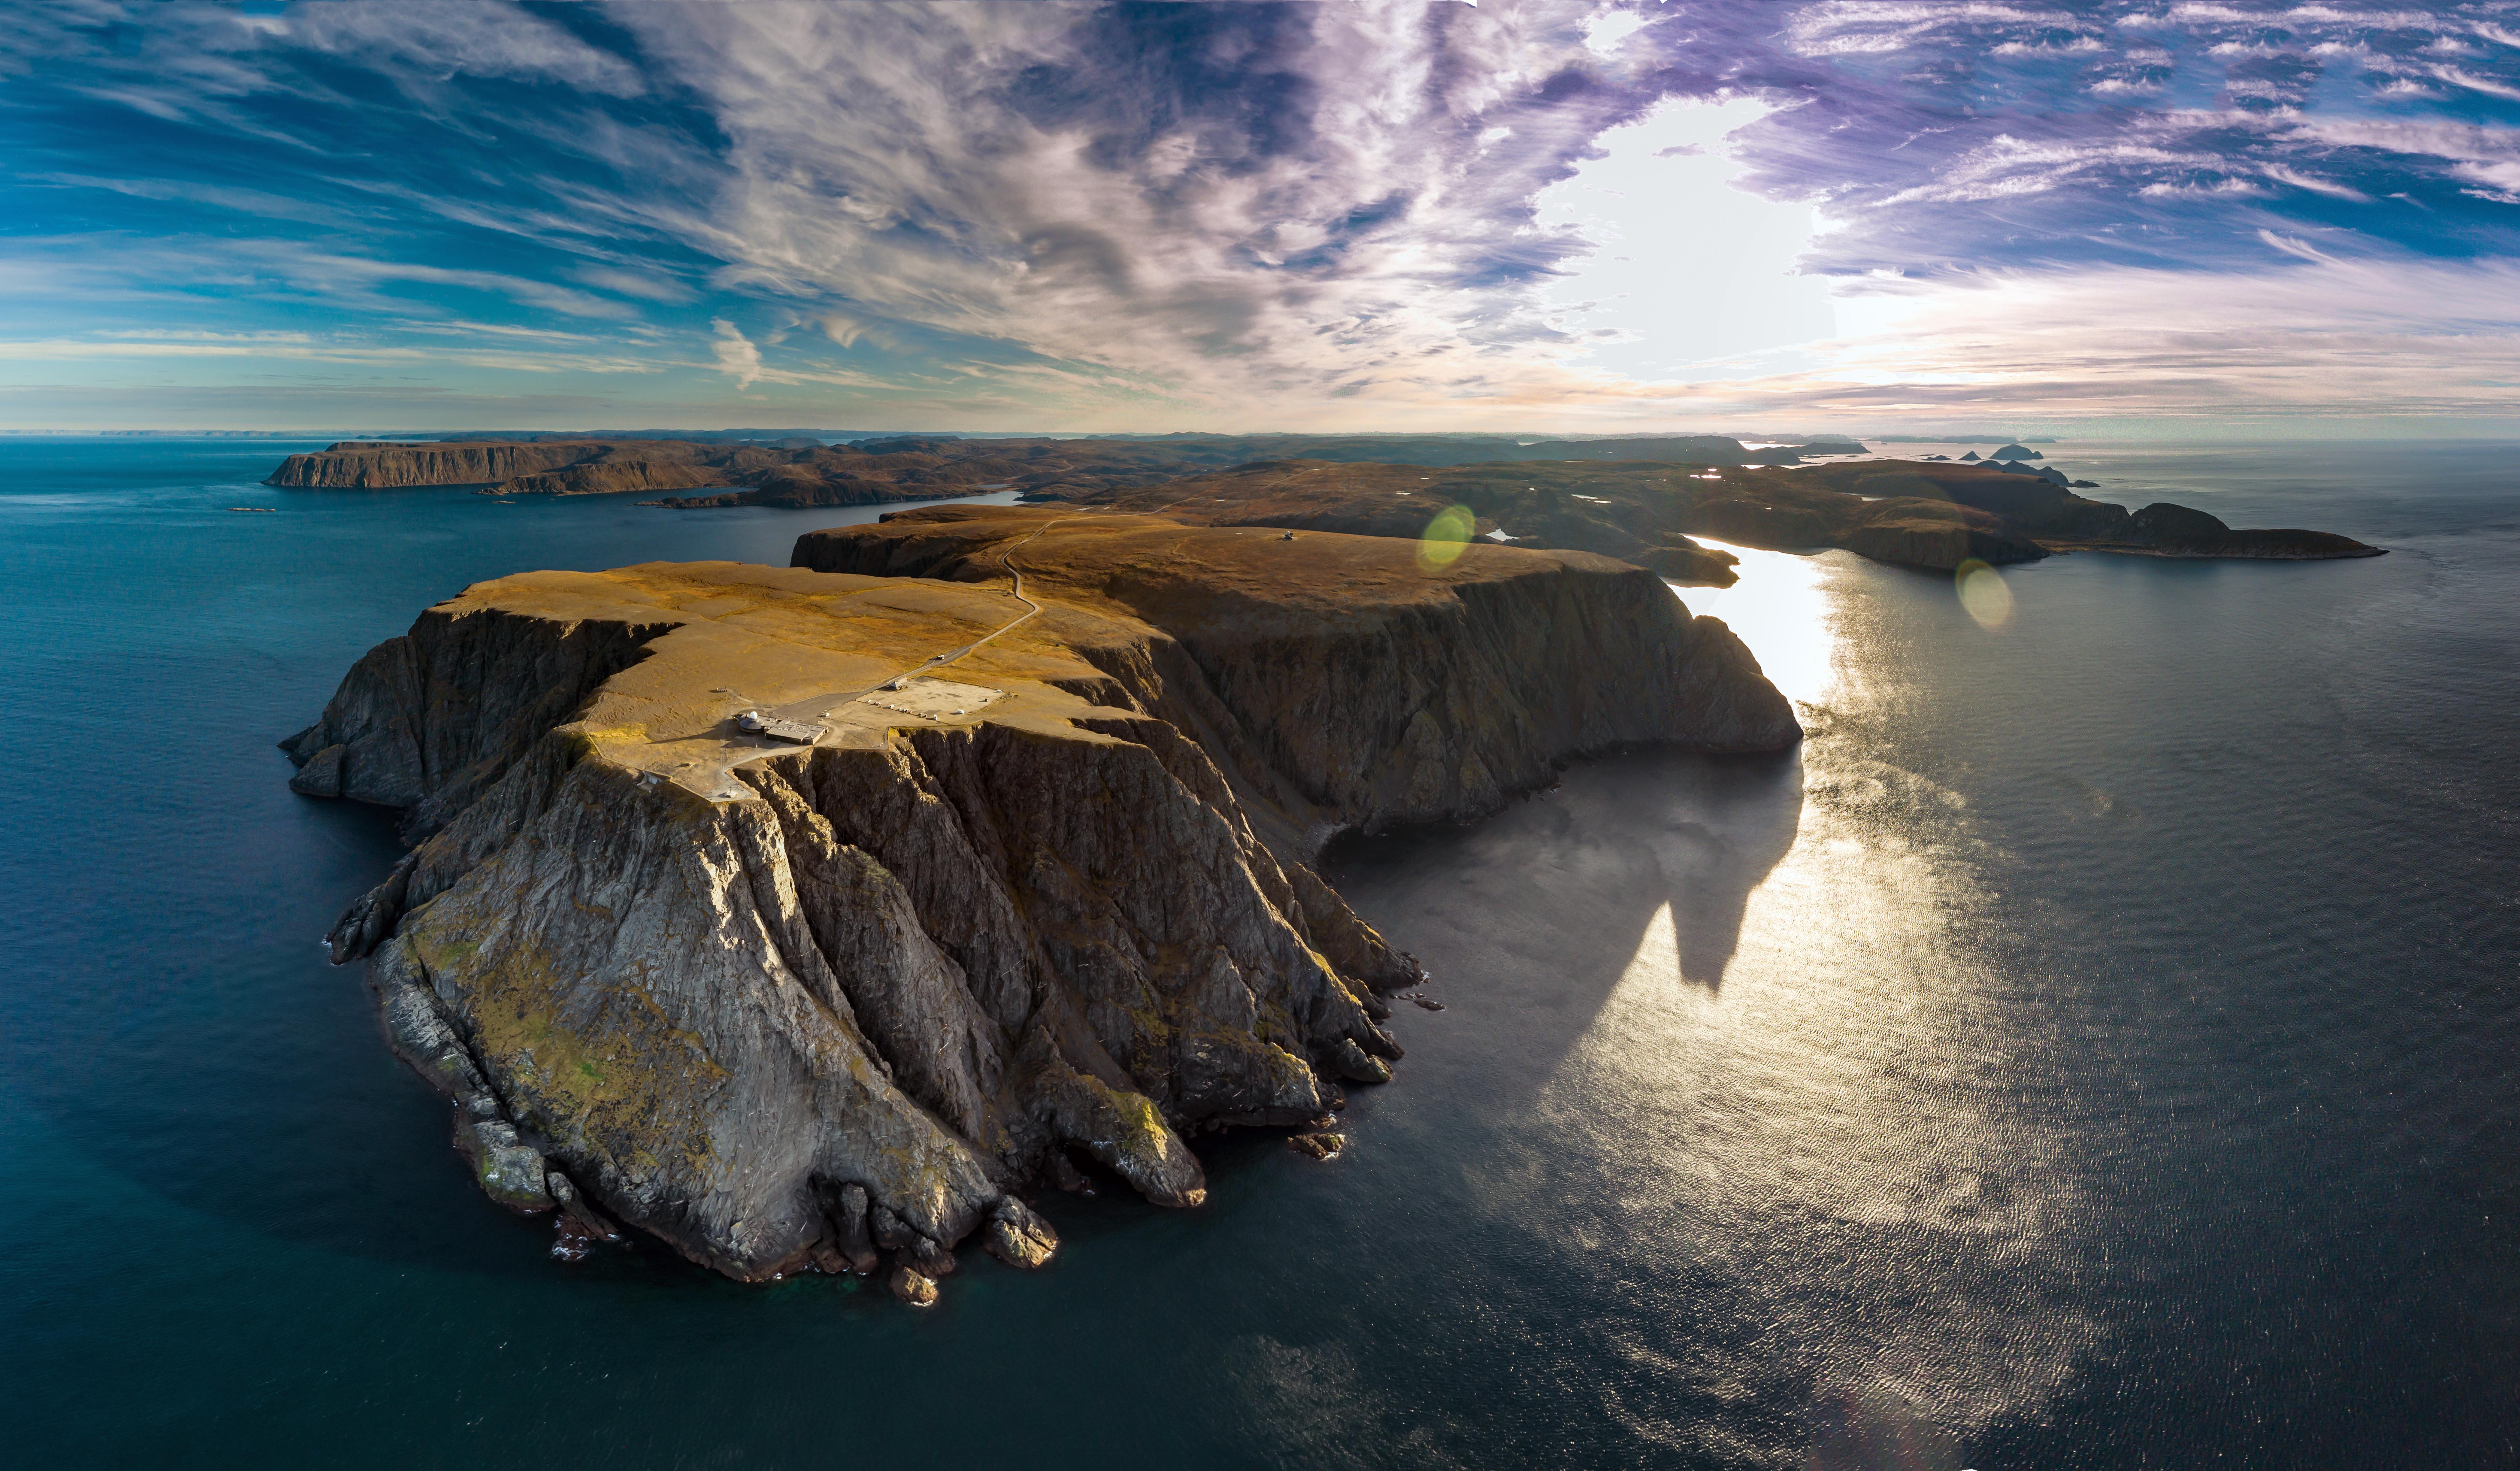 The North Cape - Edge of the world